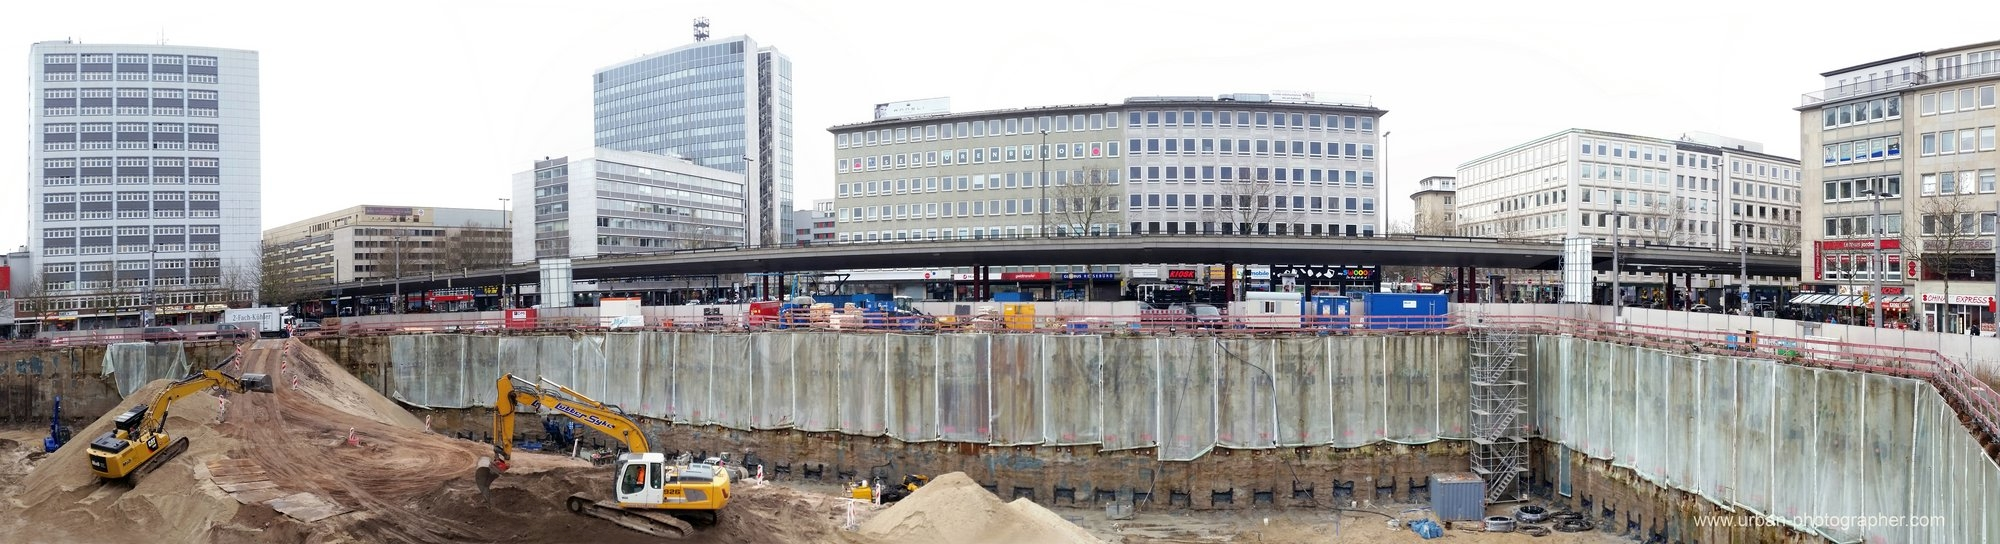 Baustelle Bahnhofsplatz 87